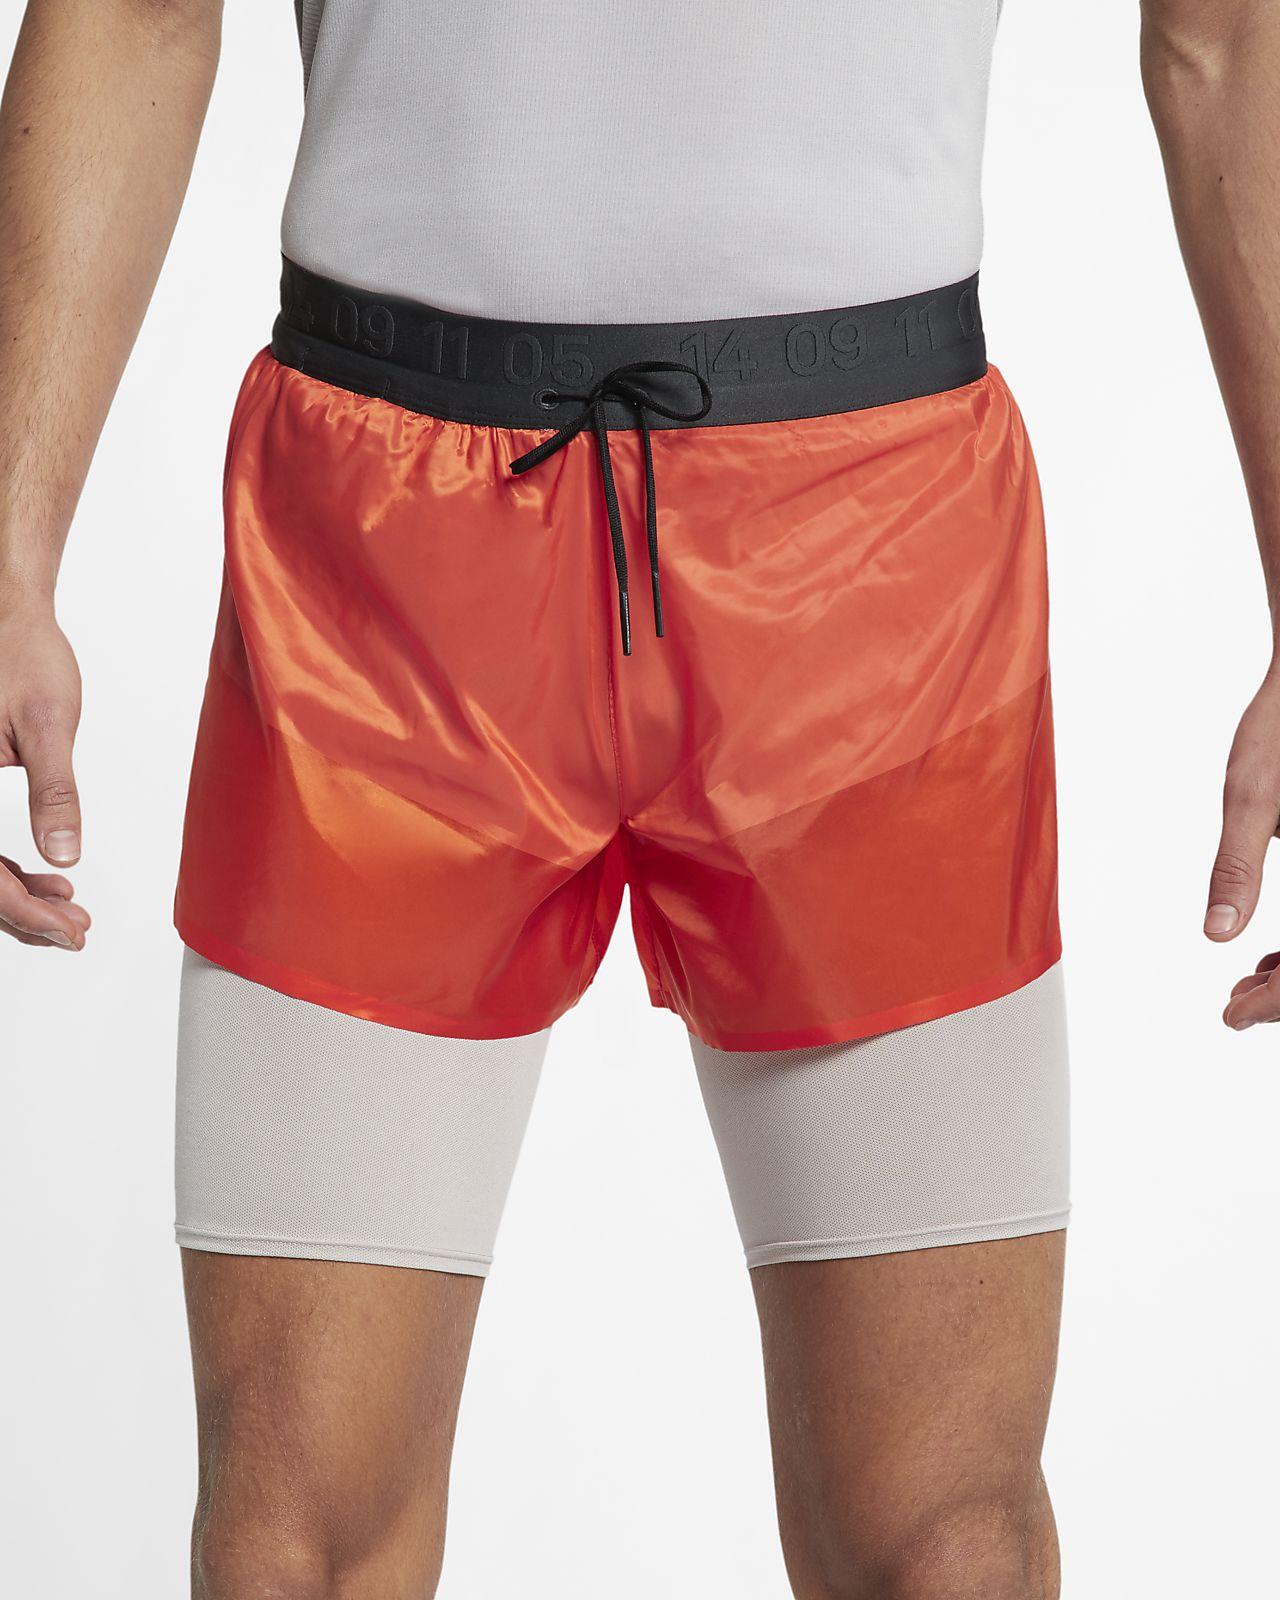 Nike Tech Pack Men's 2-in-1 Running Shorts